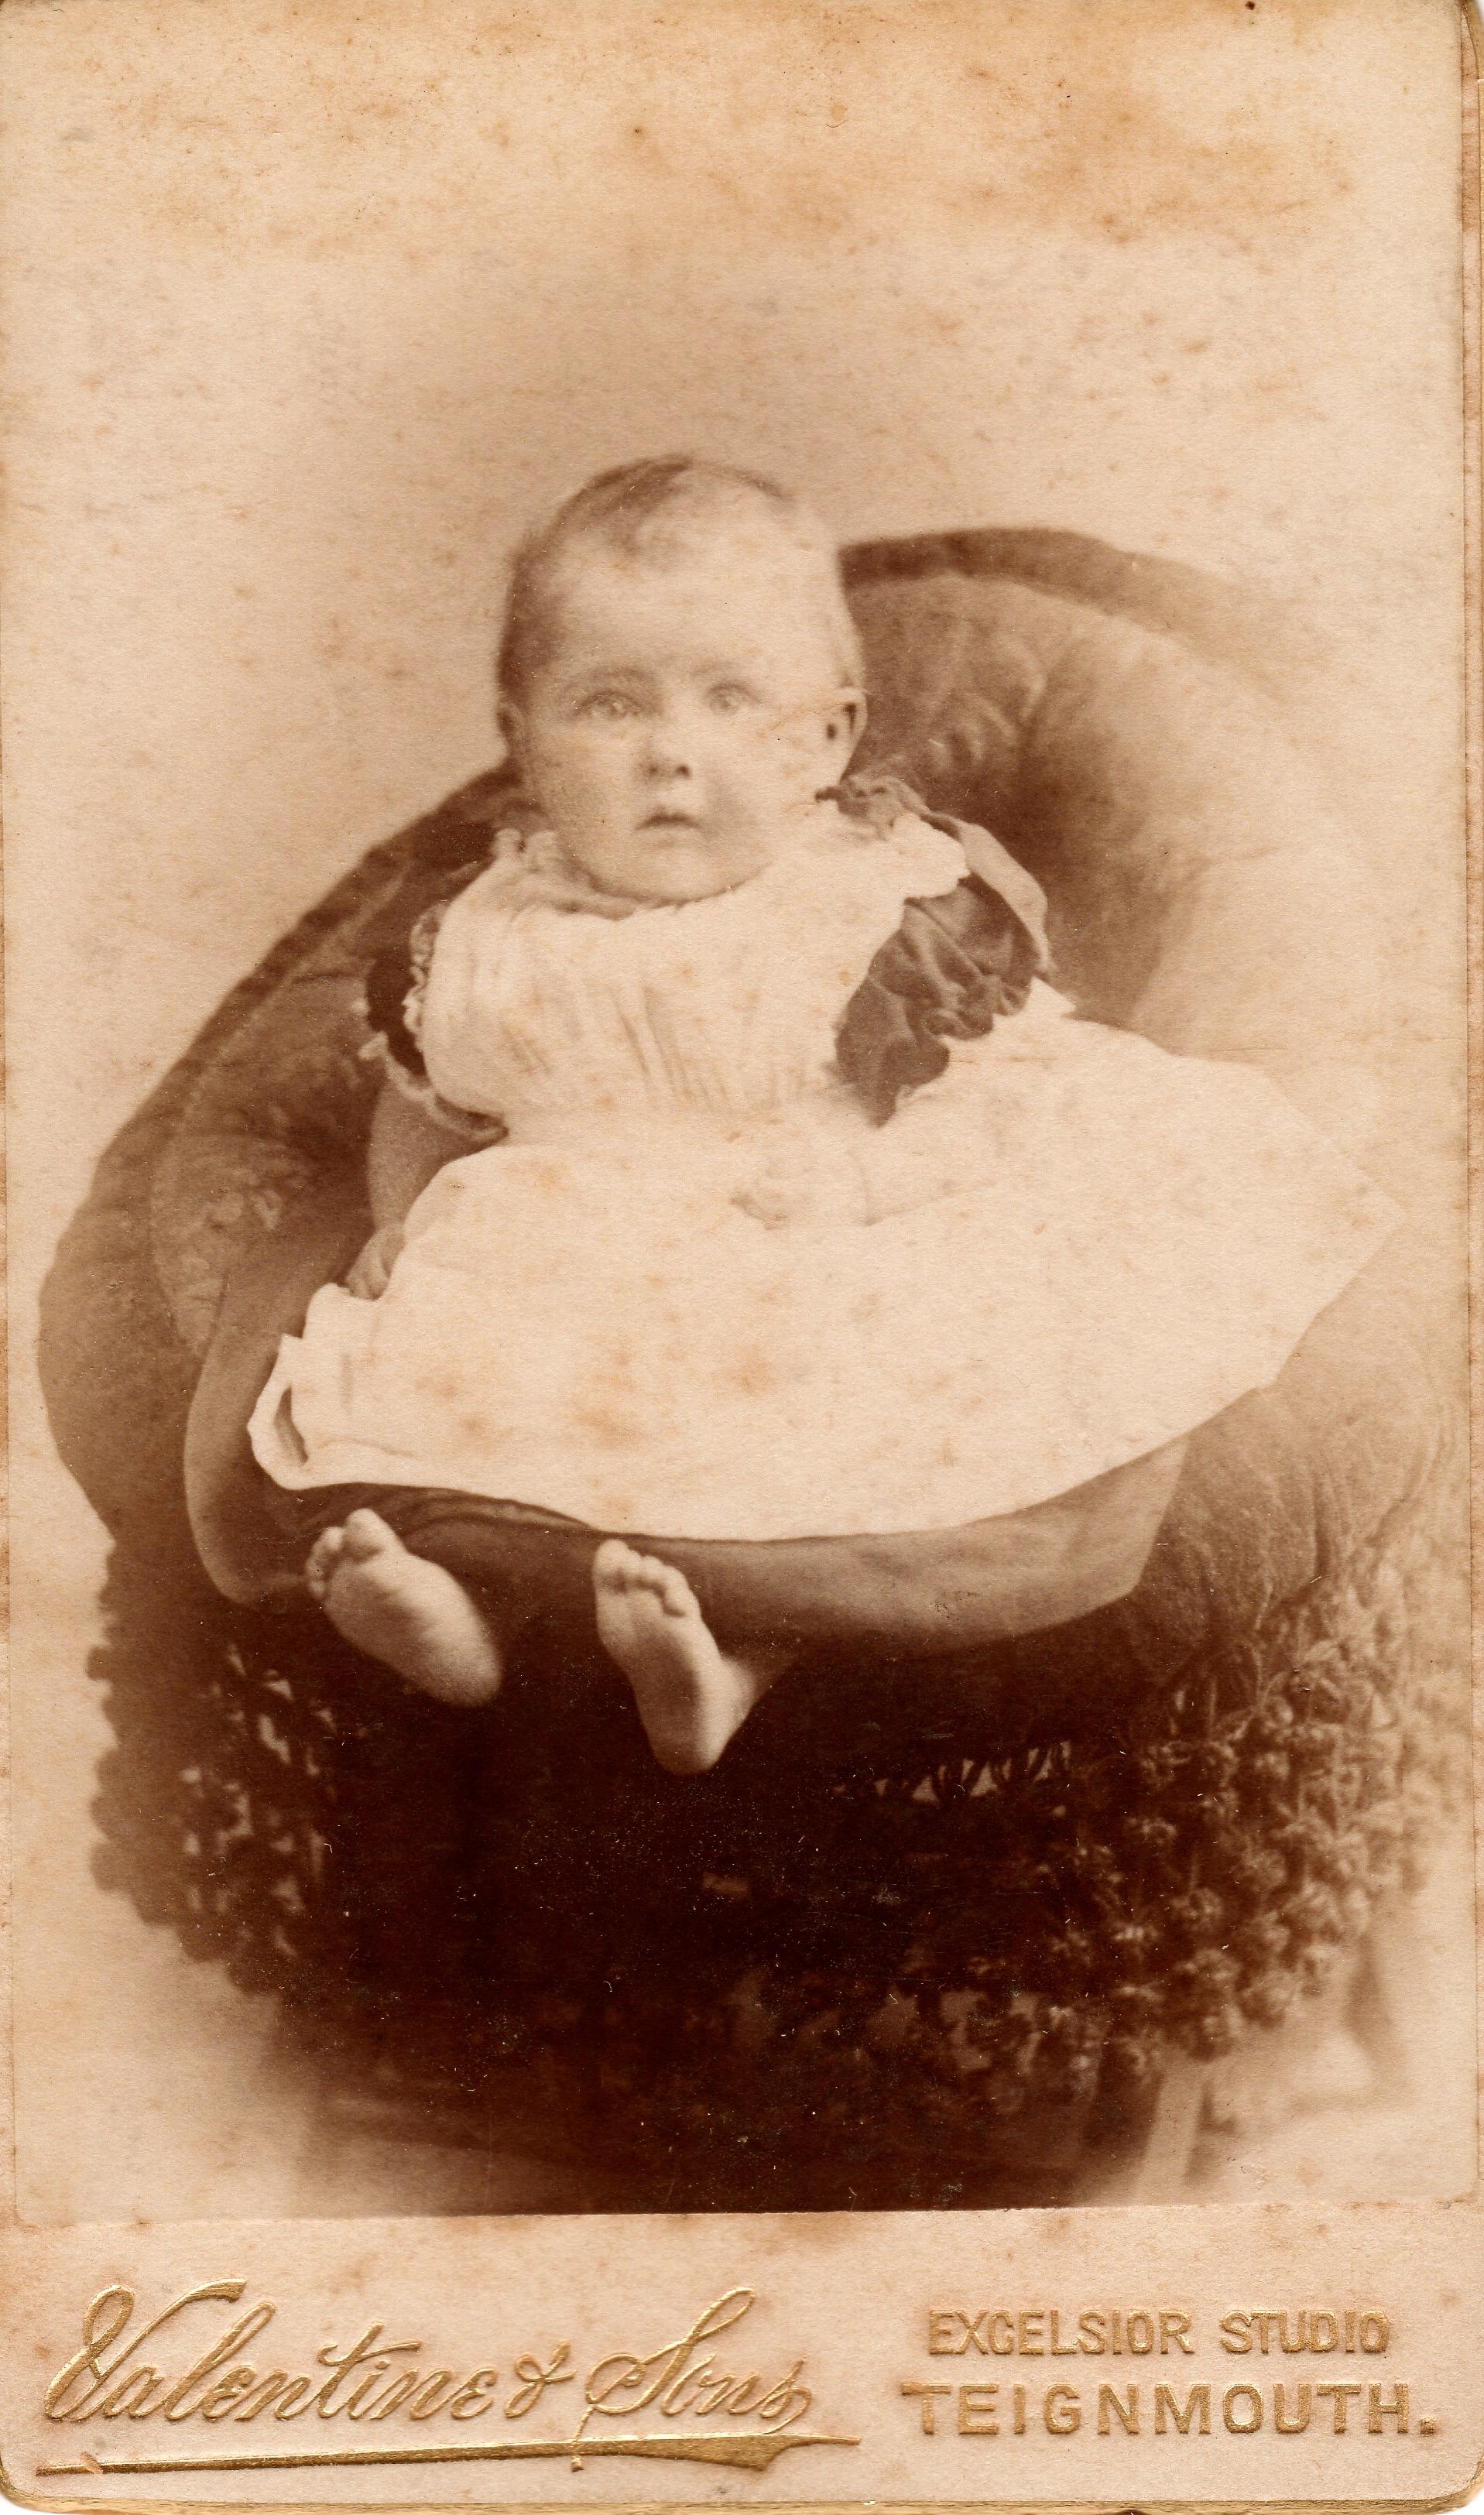 Delamore20 Baby Portrait 1